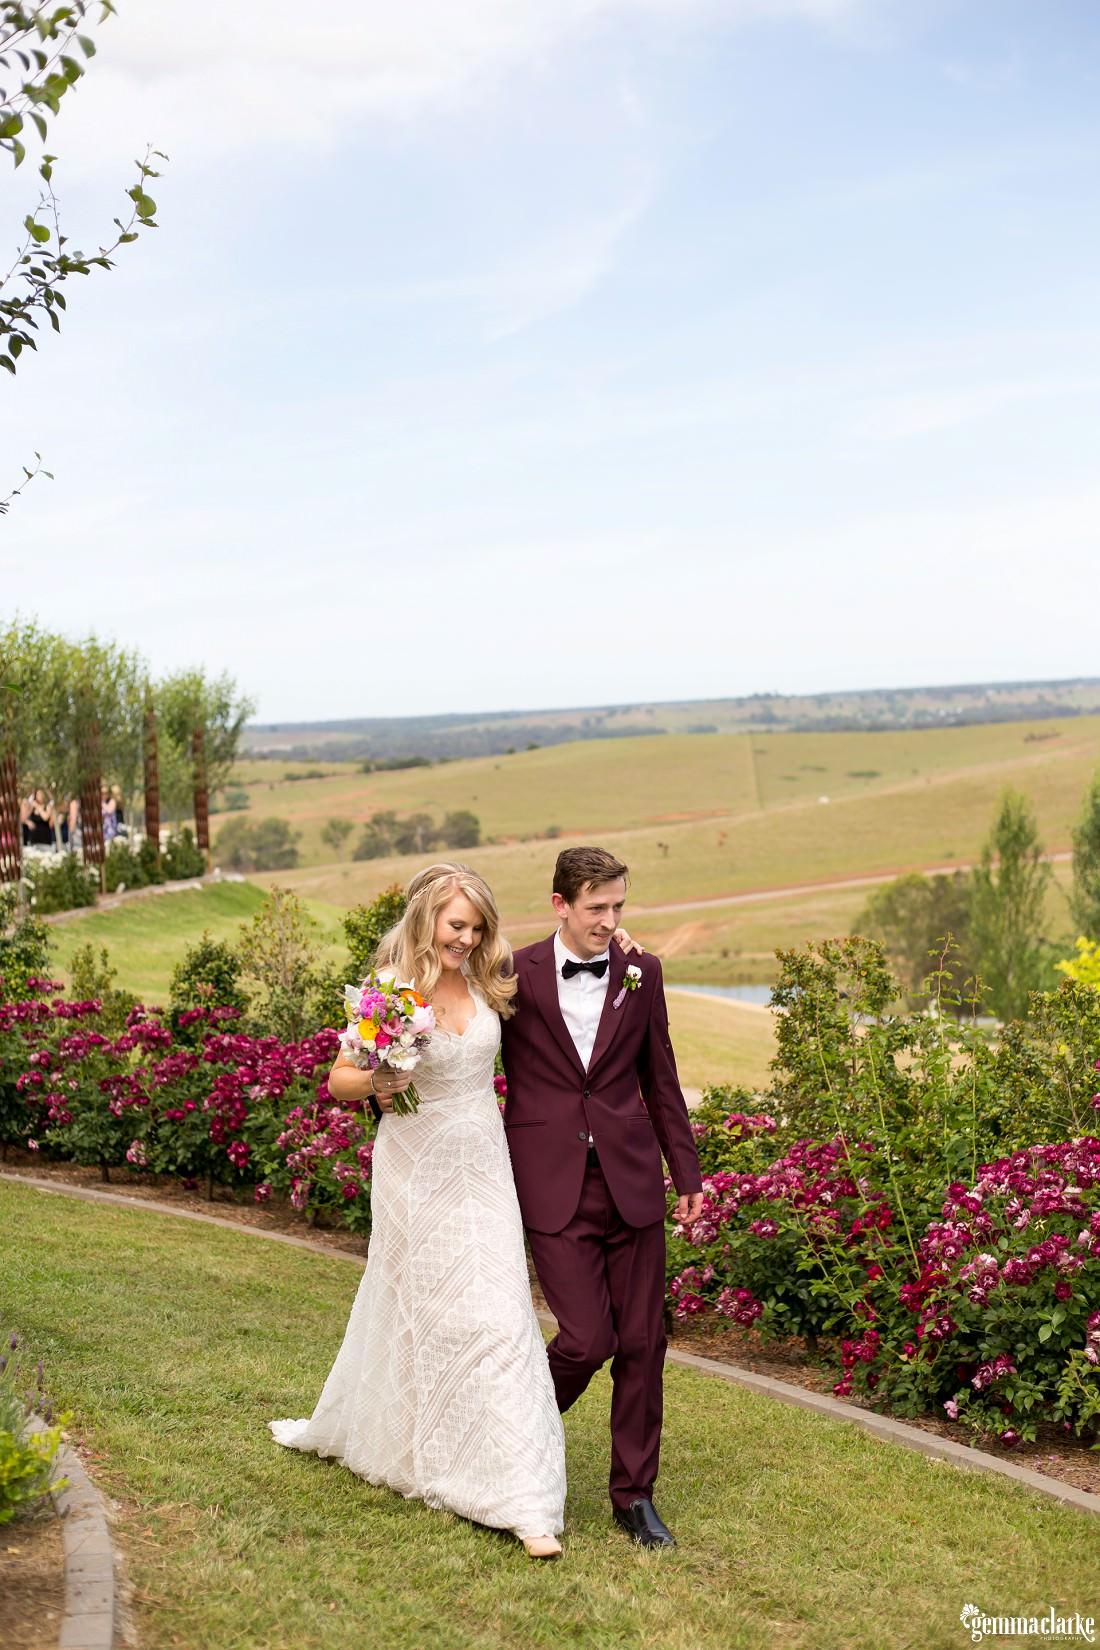 gemmaclarkephotography_sheldonbrook-wedding_country-wedding_lauren-and-mitchell_0053